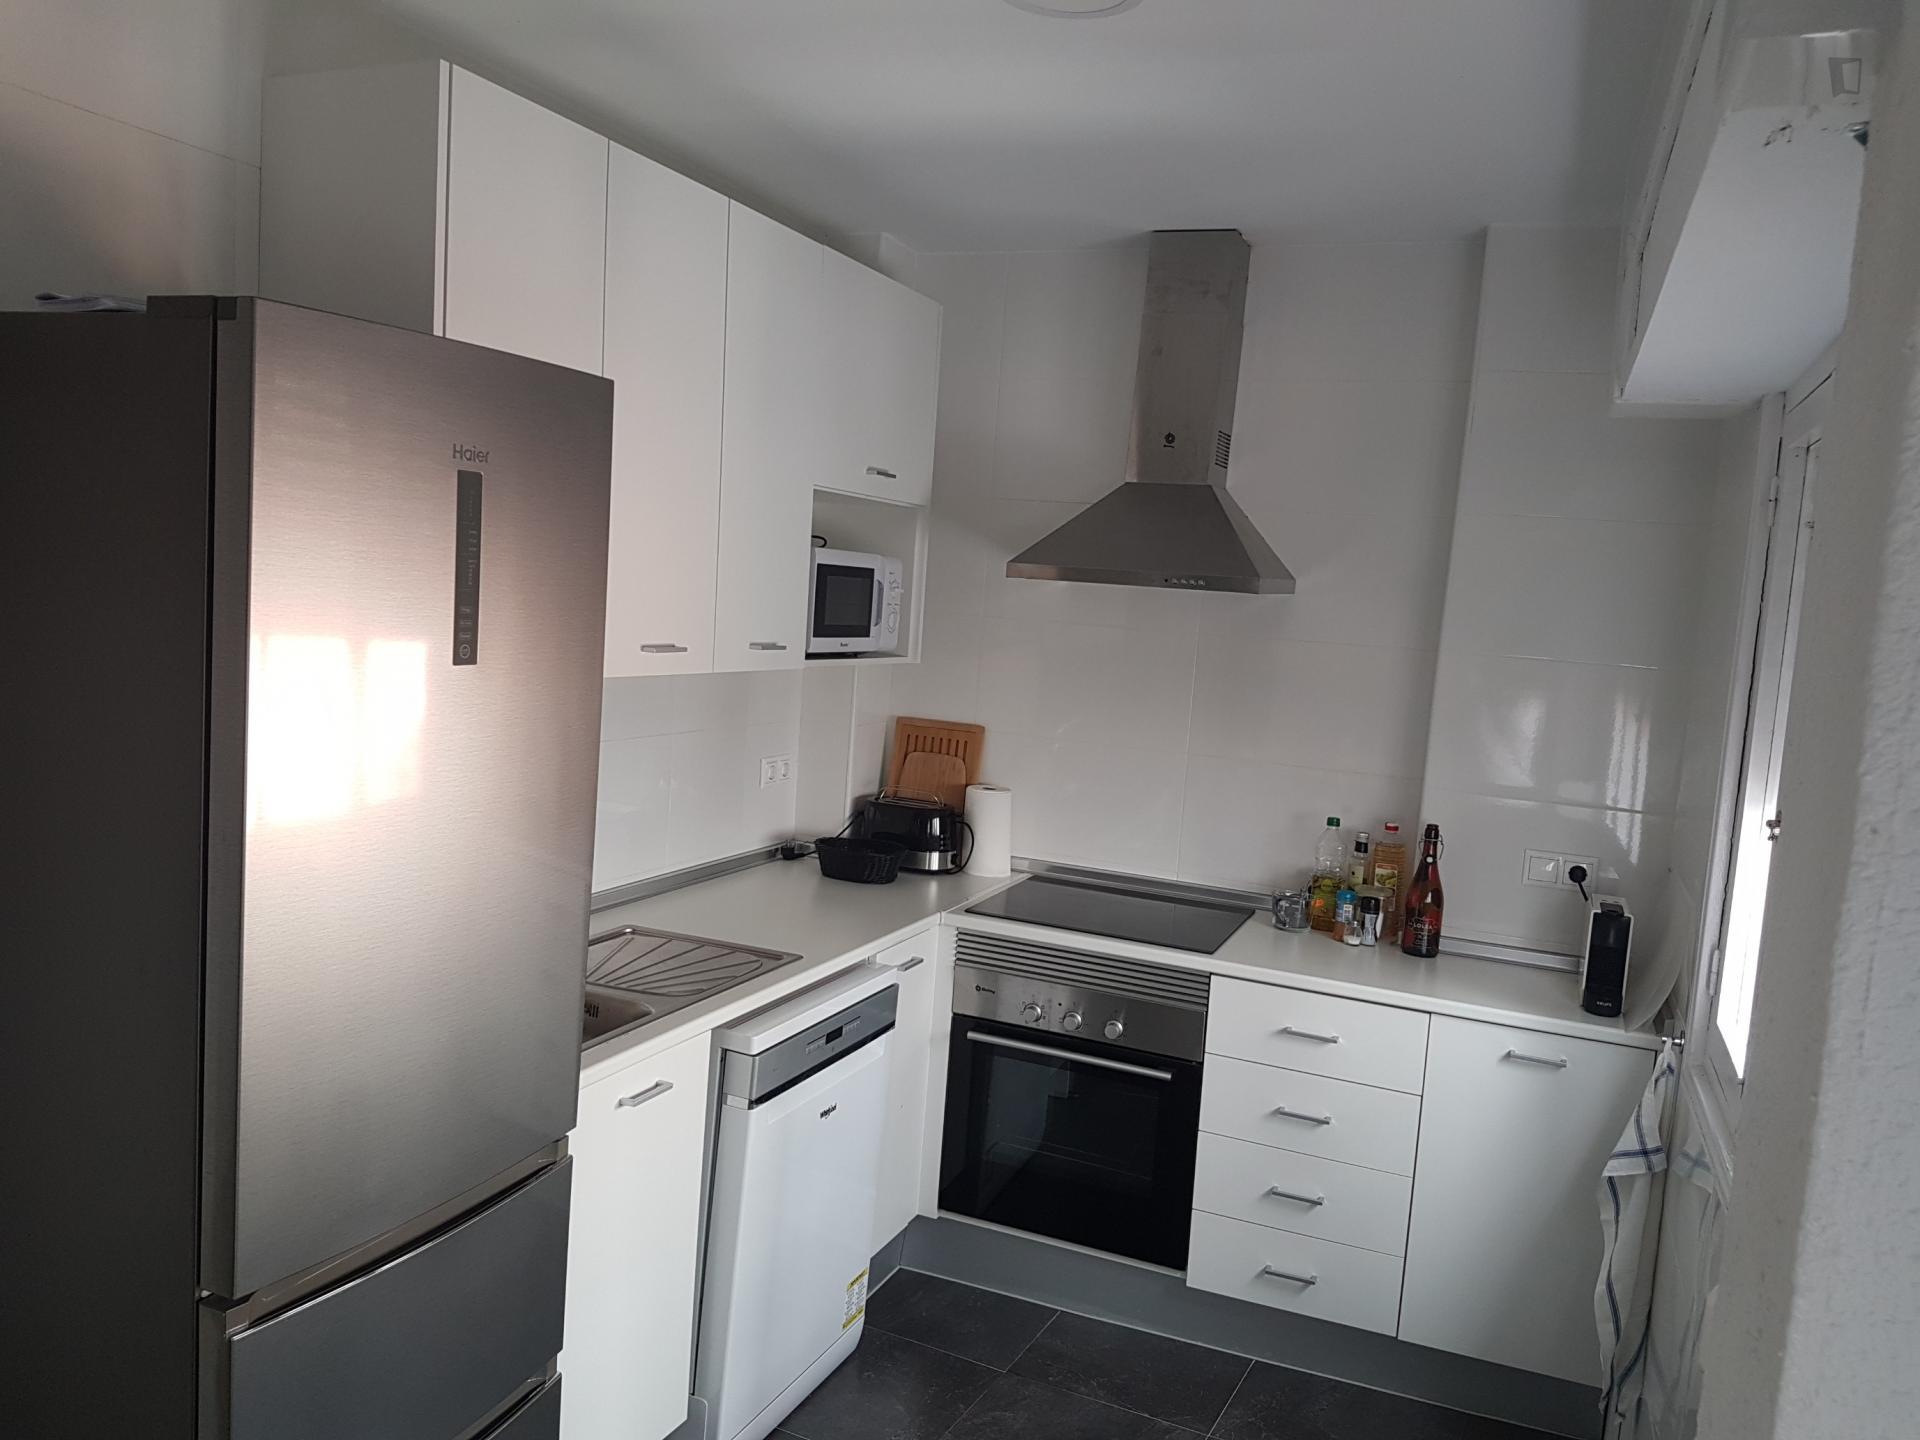 Miro - Charming 2-bedroom flat in Alicante